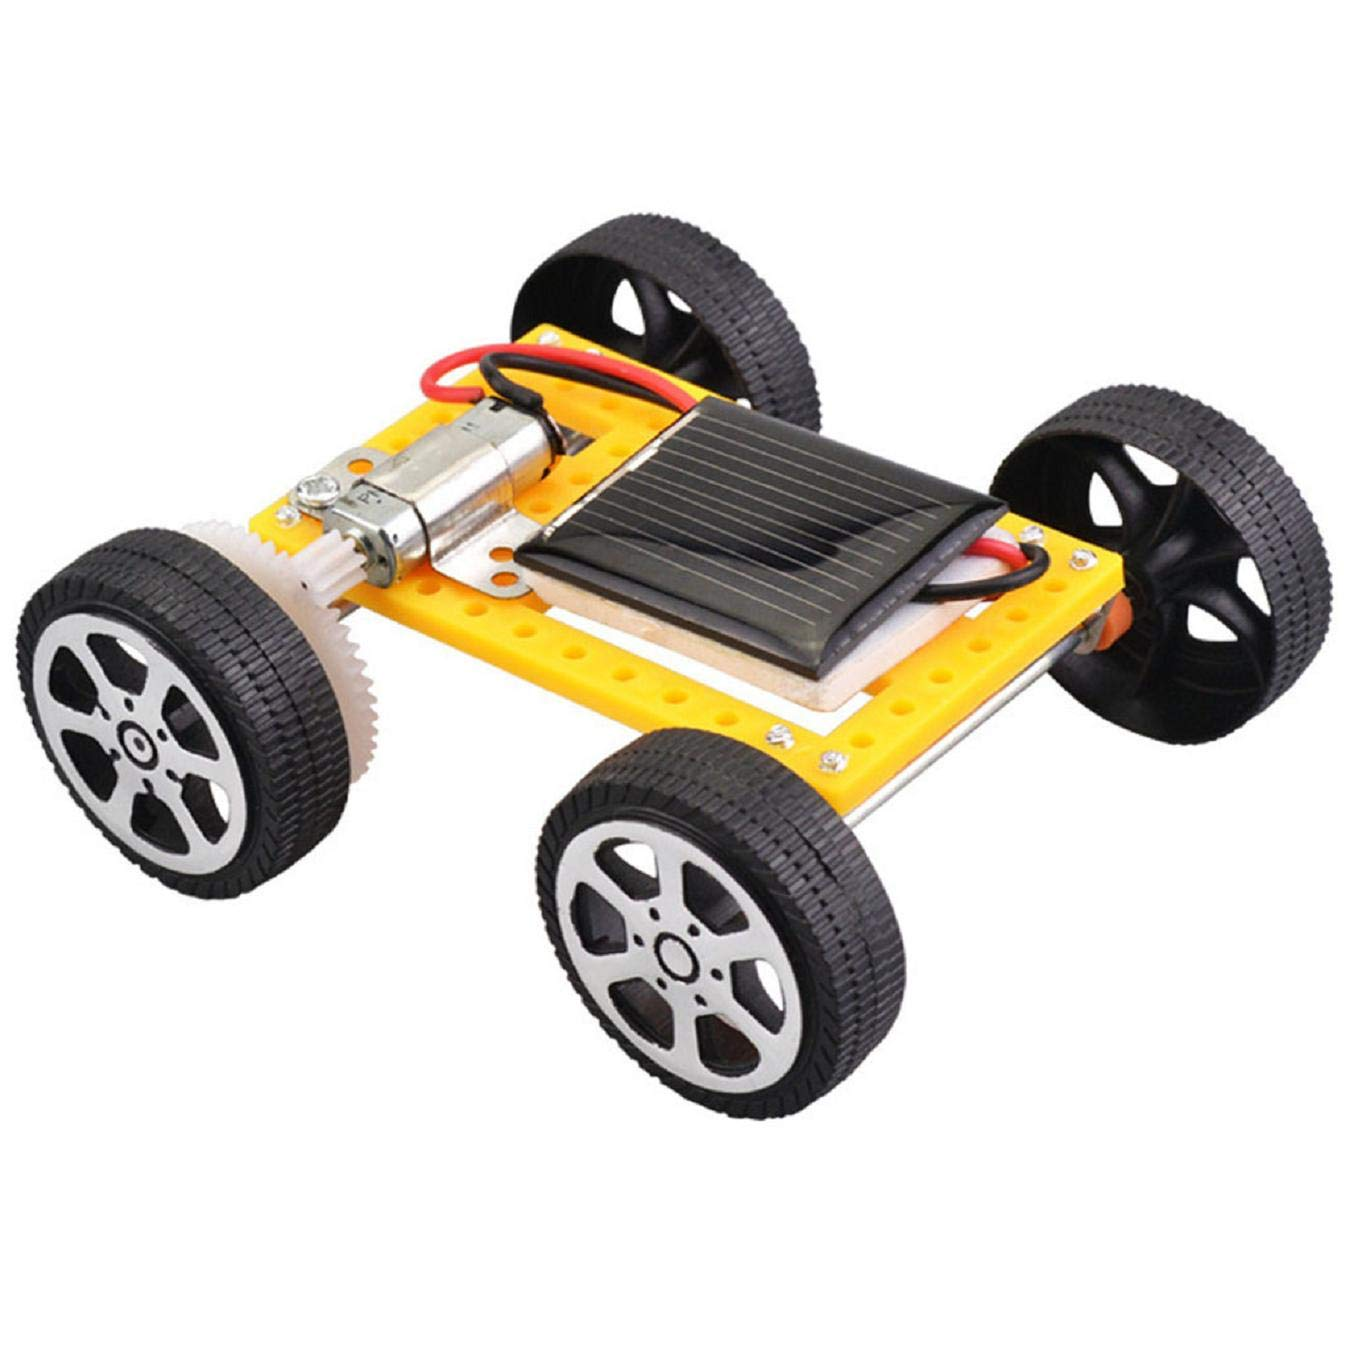 Putars Solar Car DIY Assemble Toy Set Solar Powered Car Kit Educational Science for Kid,Educational Solar Powered Toy-World's Smallest Solar Powered Car,Birthday Gift Present for Kids